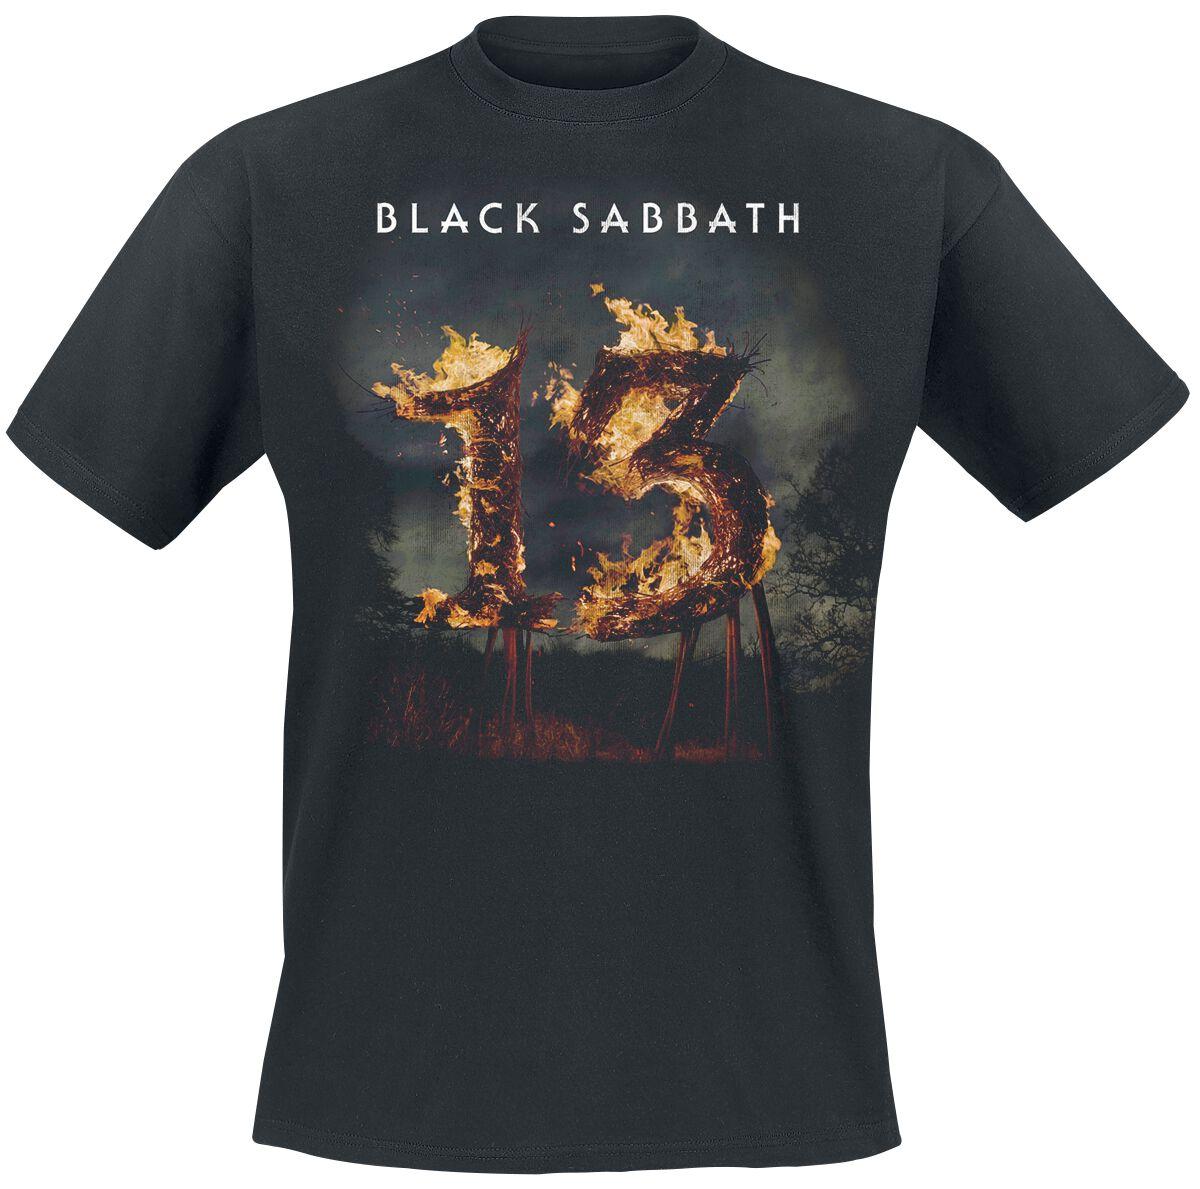 Zespoły - Koszulki - T-Shirt Black Sabbath 13 Tracklist T-Shirt czarny - 371325